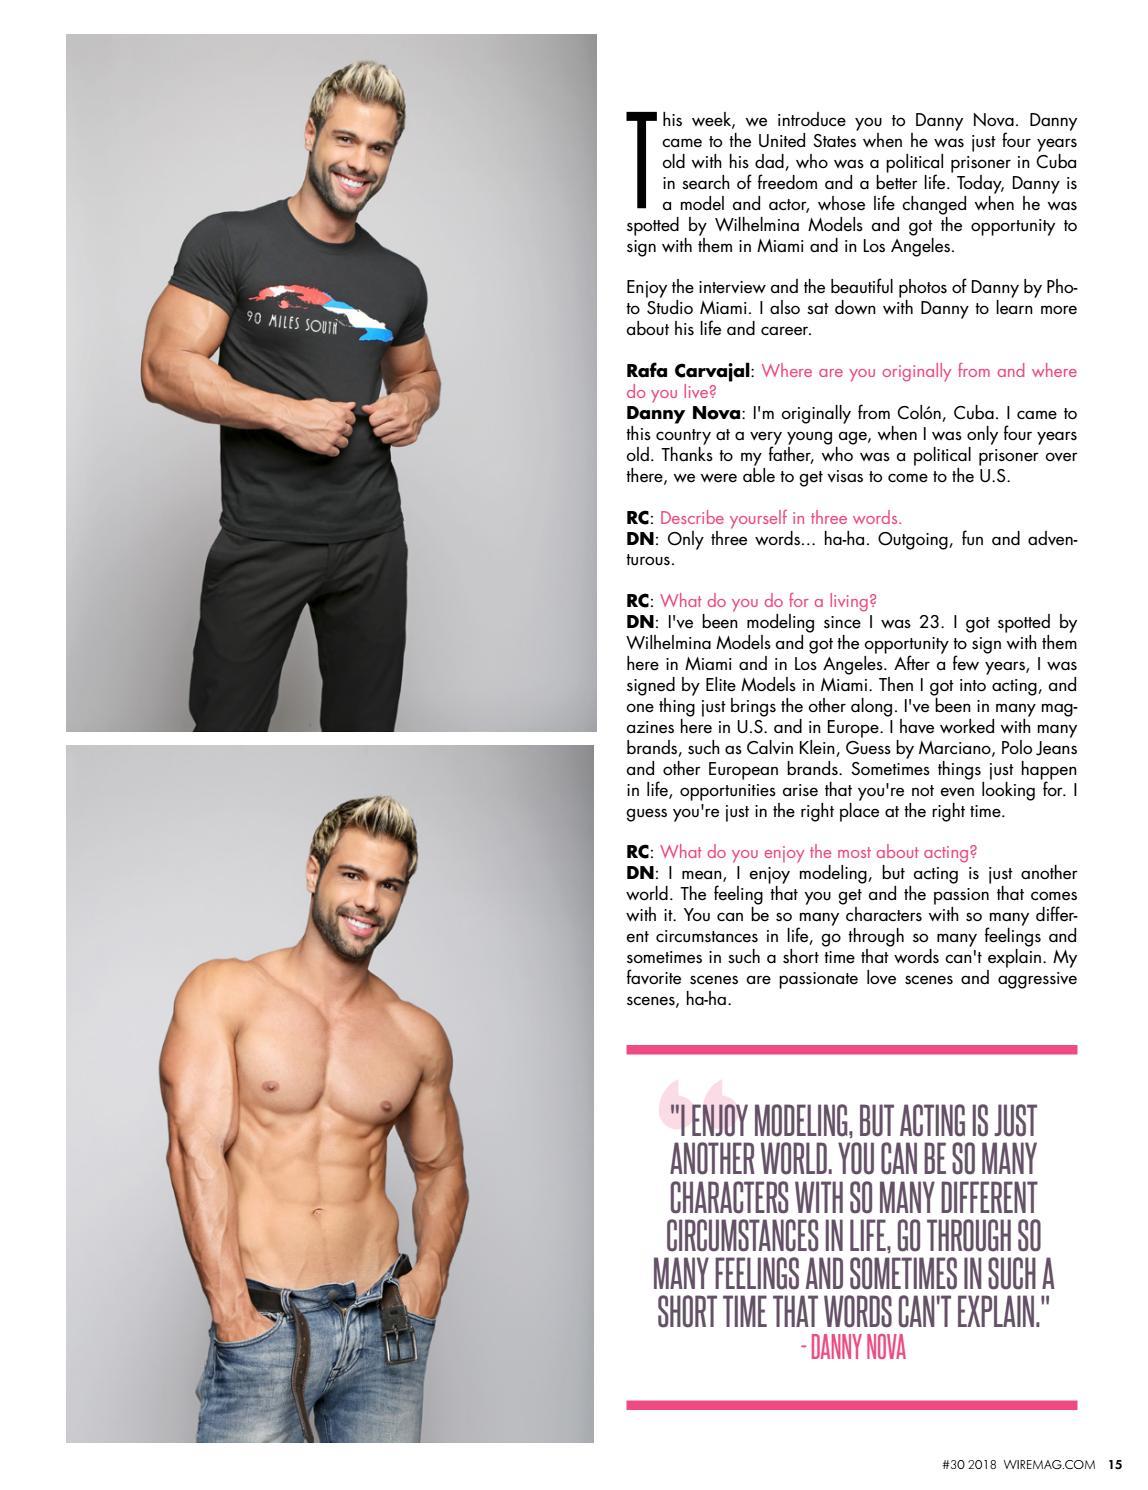 Wire Magazine 30 2018 Meet Beautiful Model Actor Danny Nova By Media Group Issuu